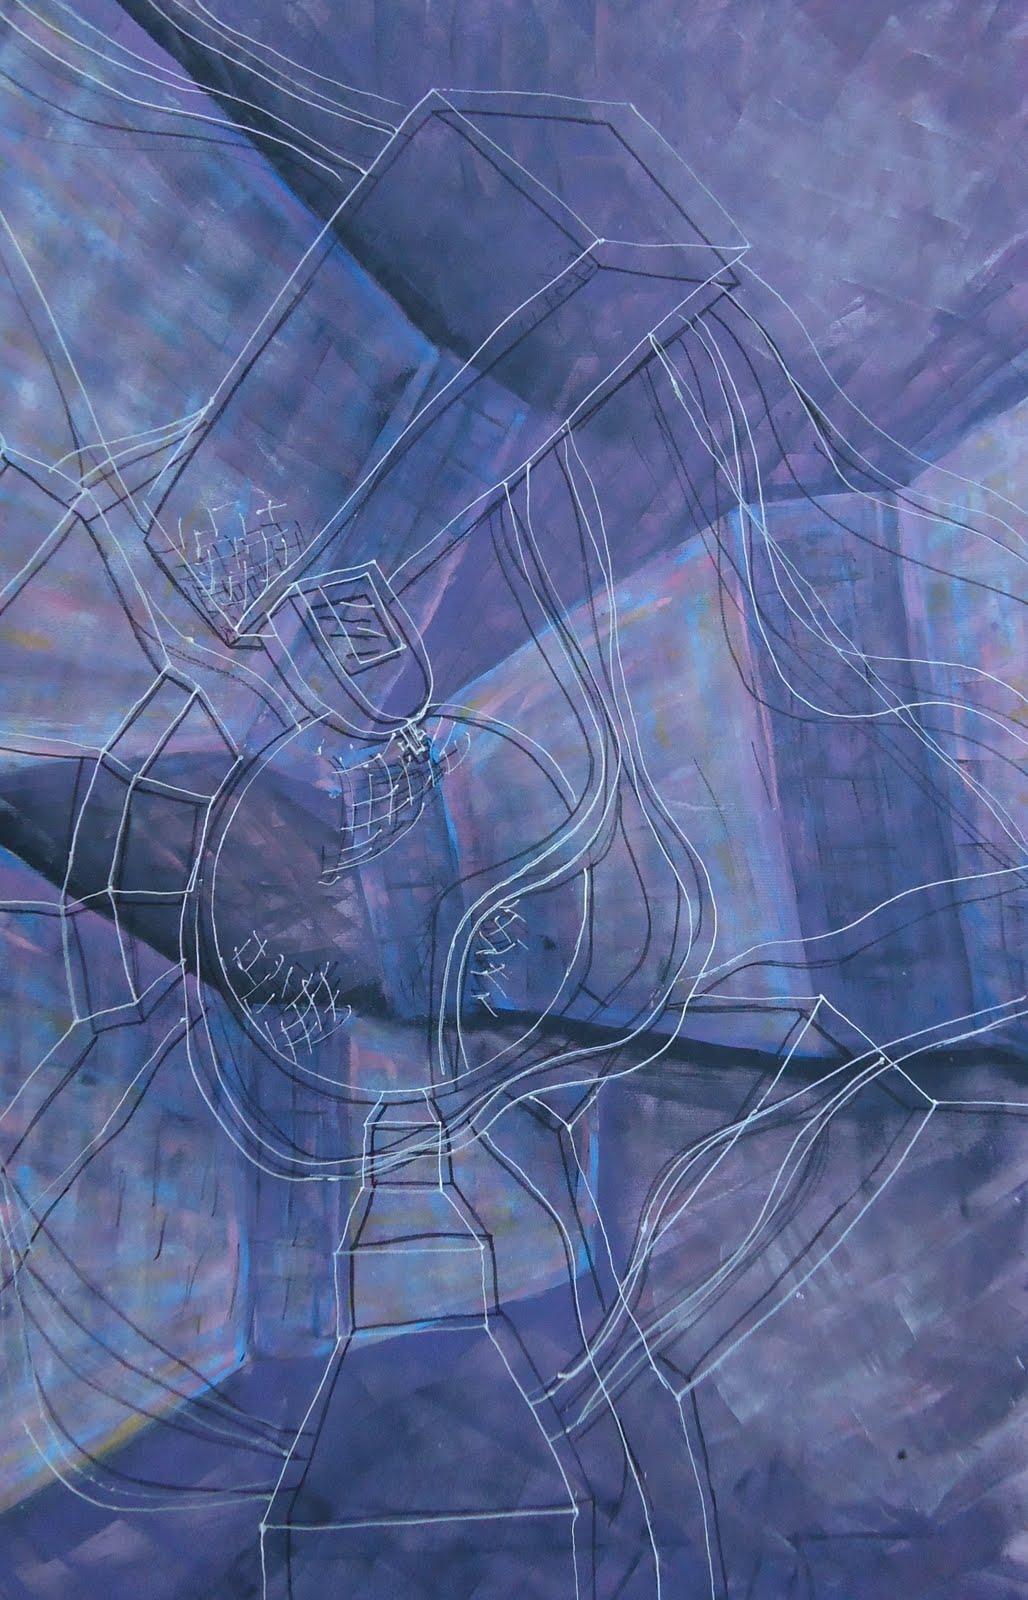 Carlise artes arte contempor nea puxando as cortinas para as mem rias do corpo - Cortinas contemporaneas ...